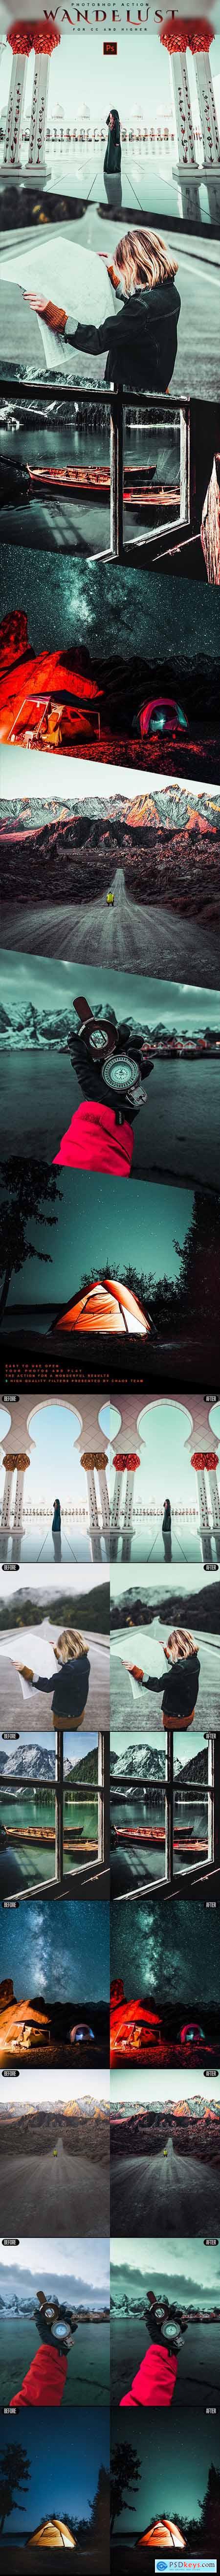 Wanderlust - Photoshop Action 28854054